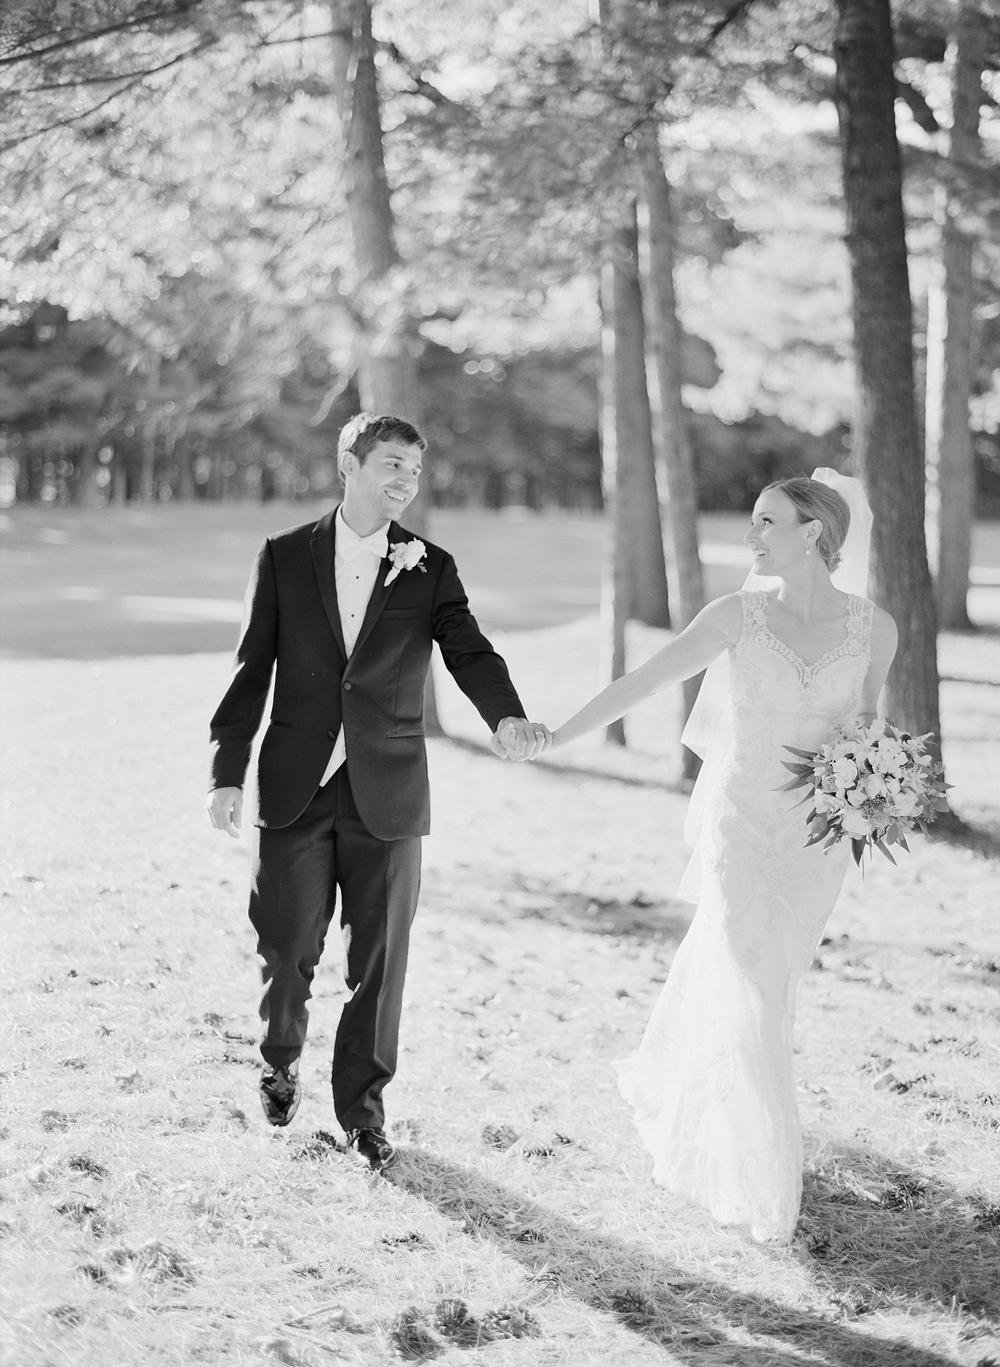 wausau_country_club_wedding_photographer_019.jpg